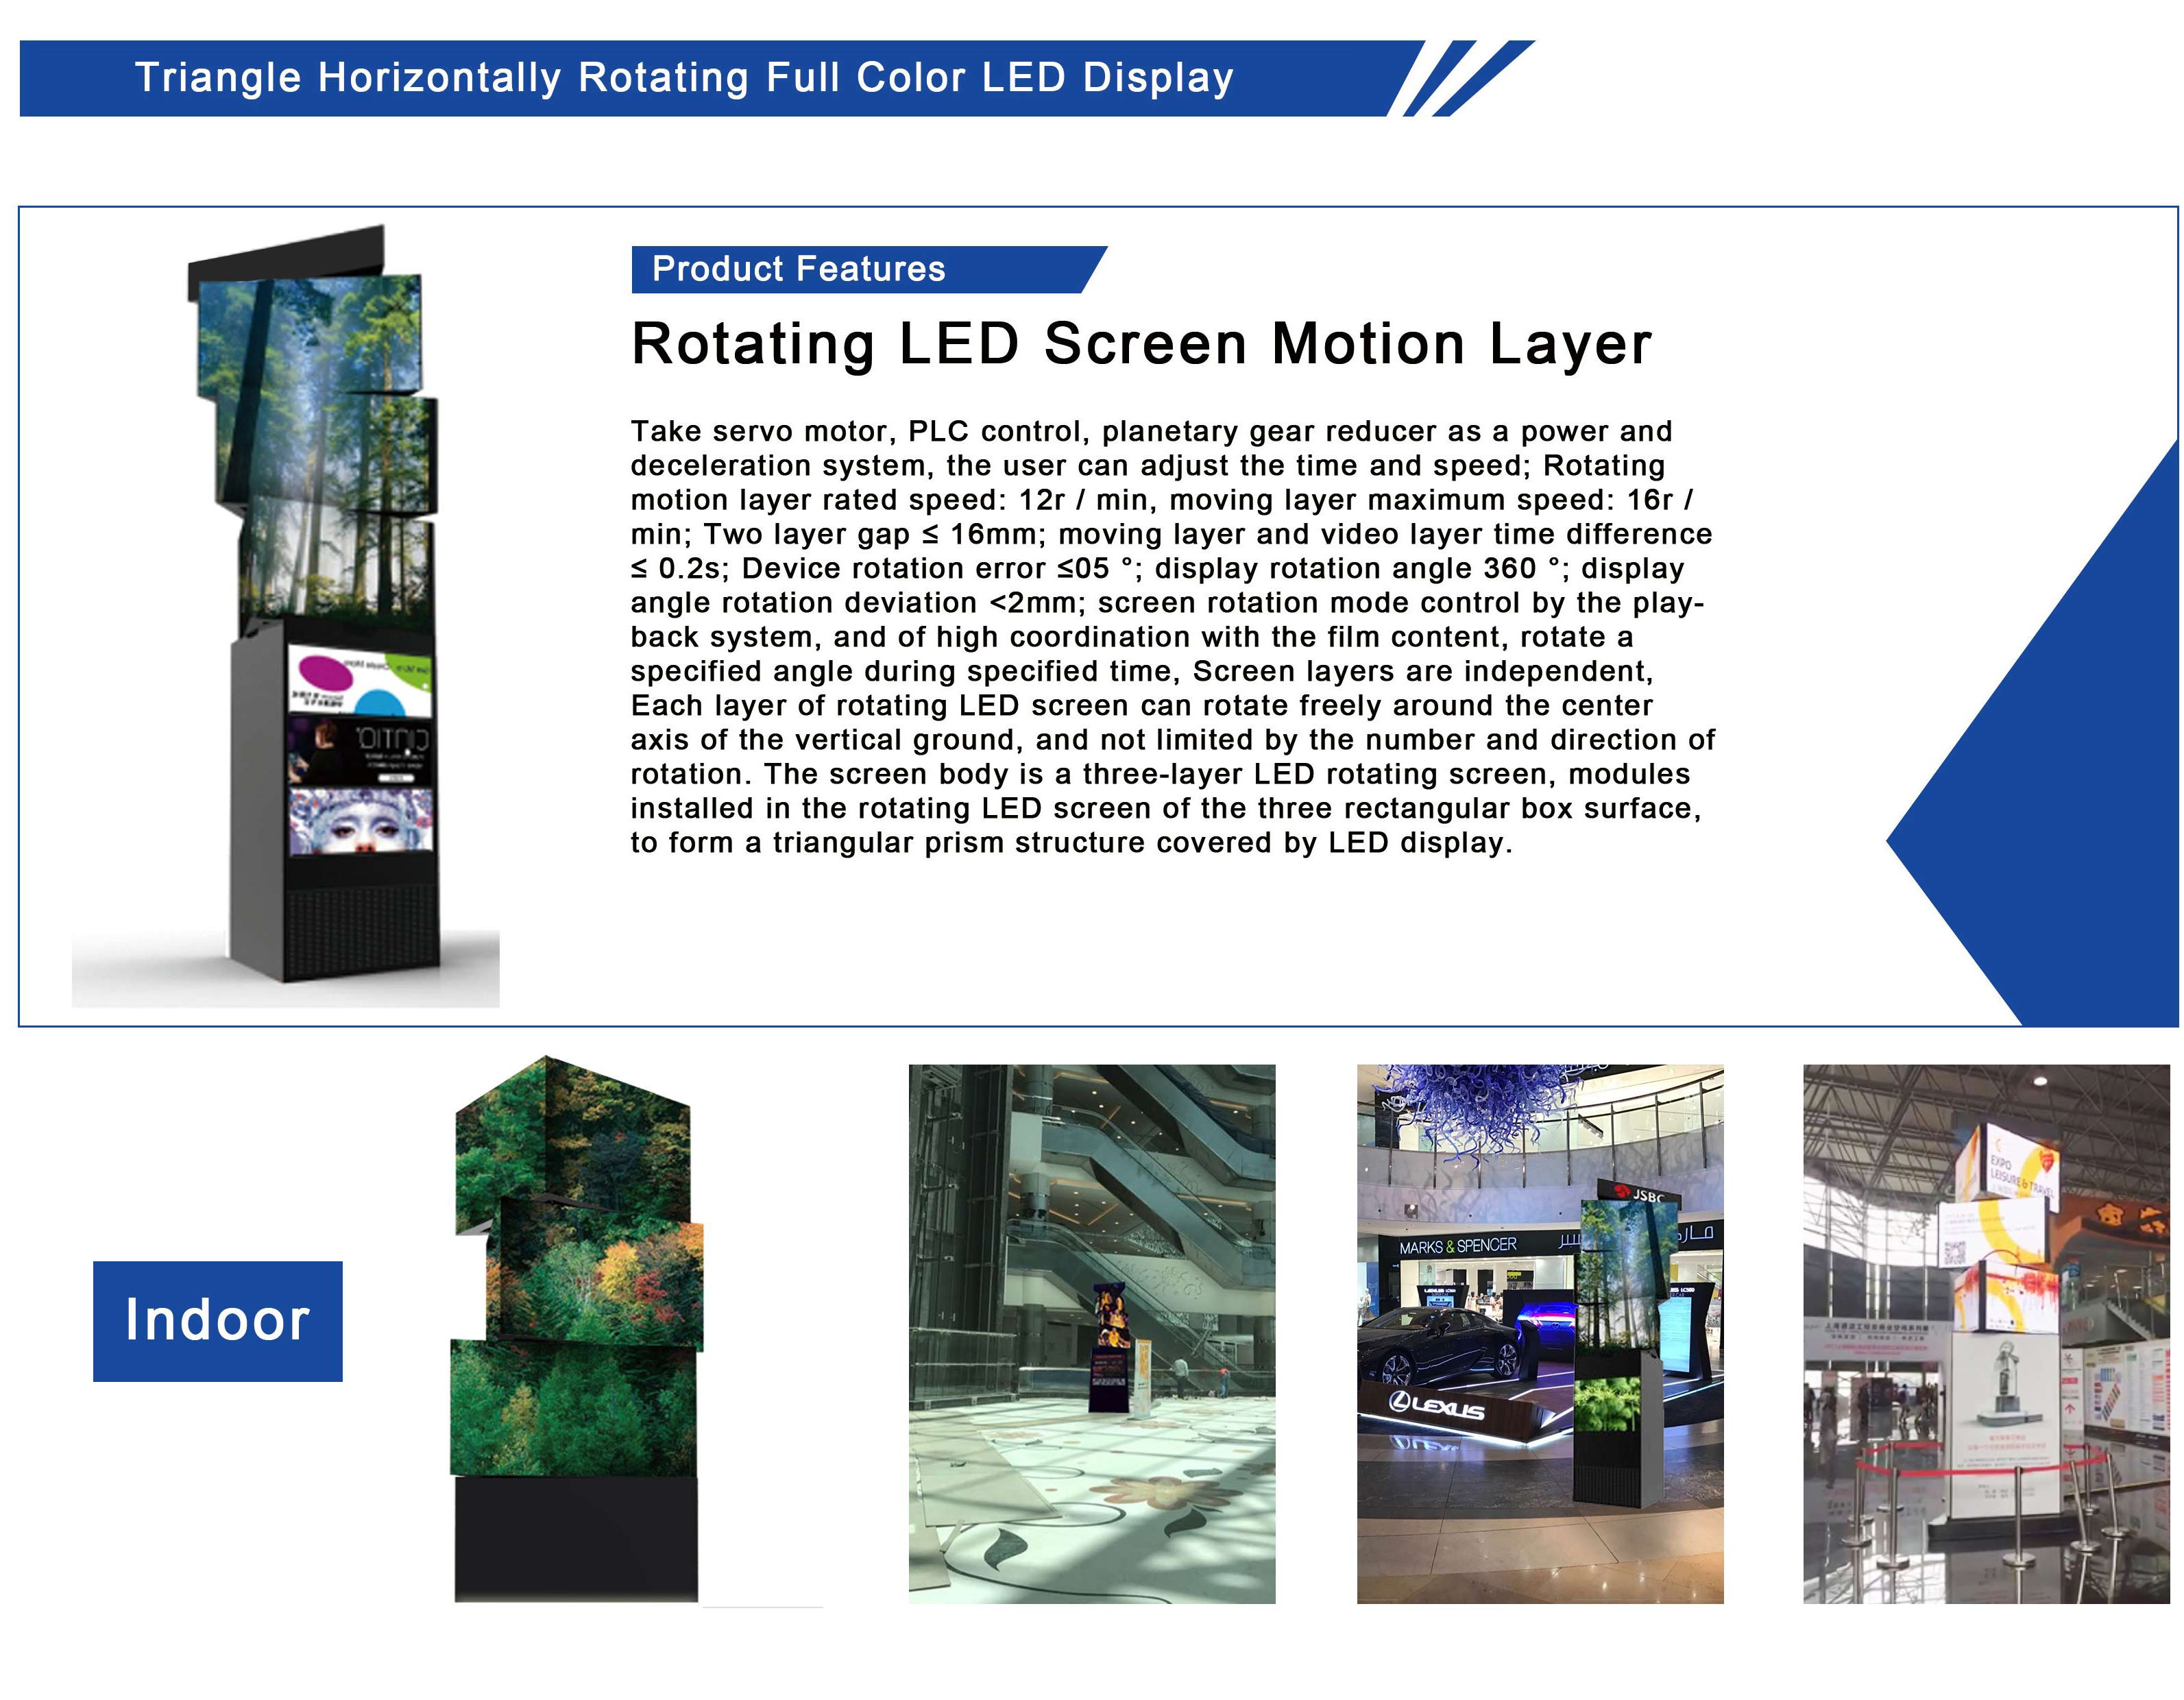 Rotating LED Screen Motion Layer